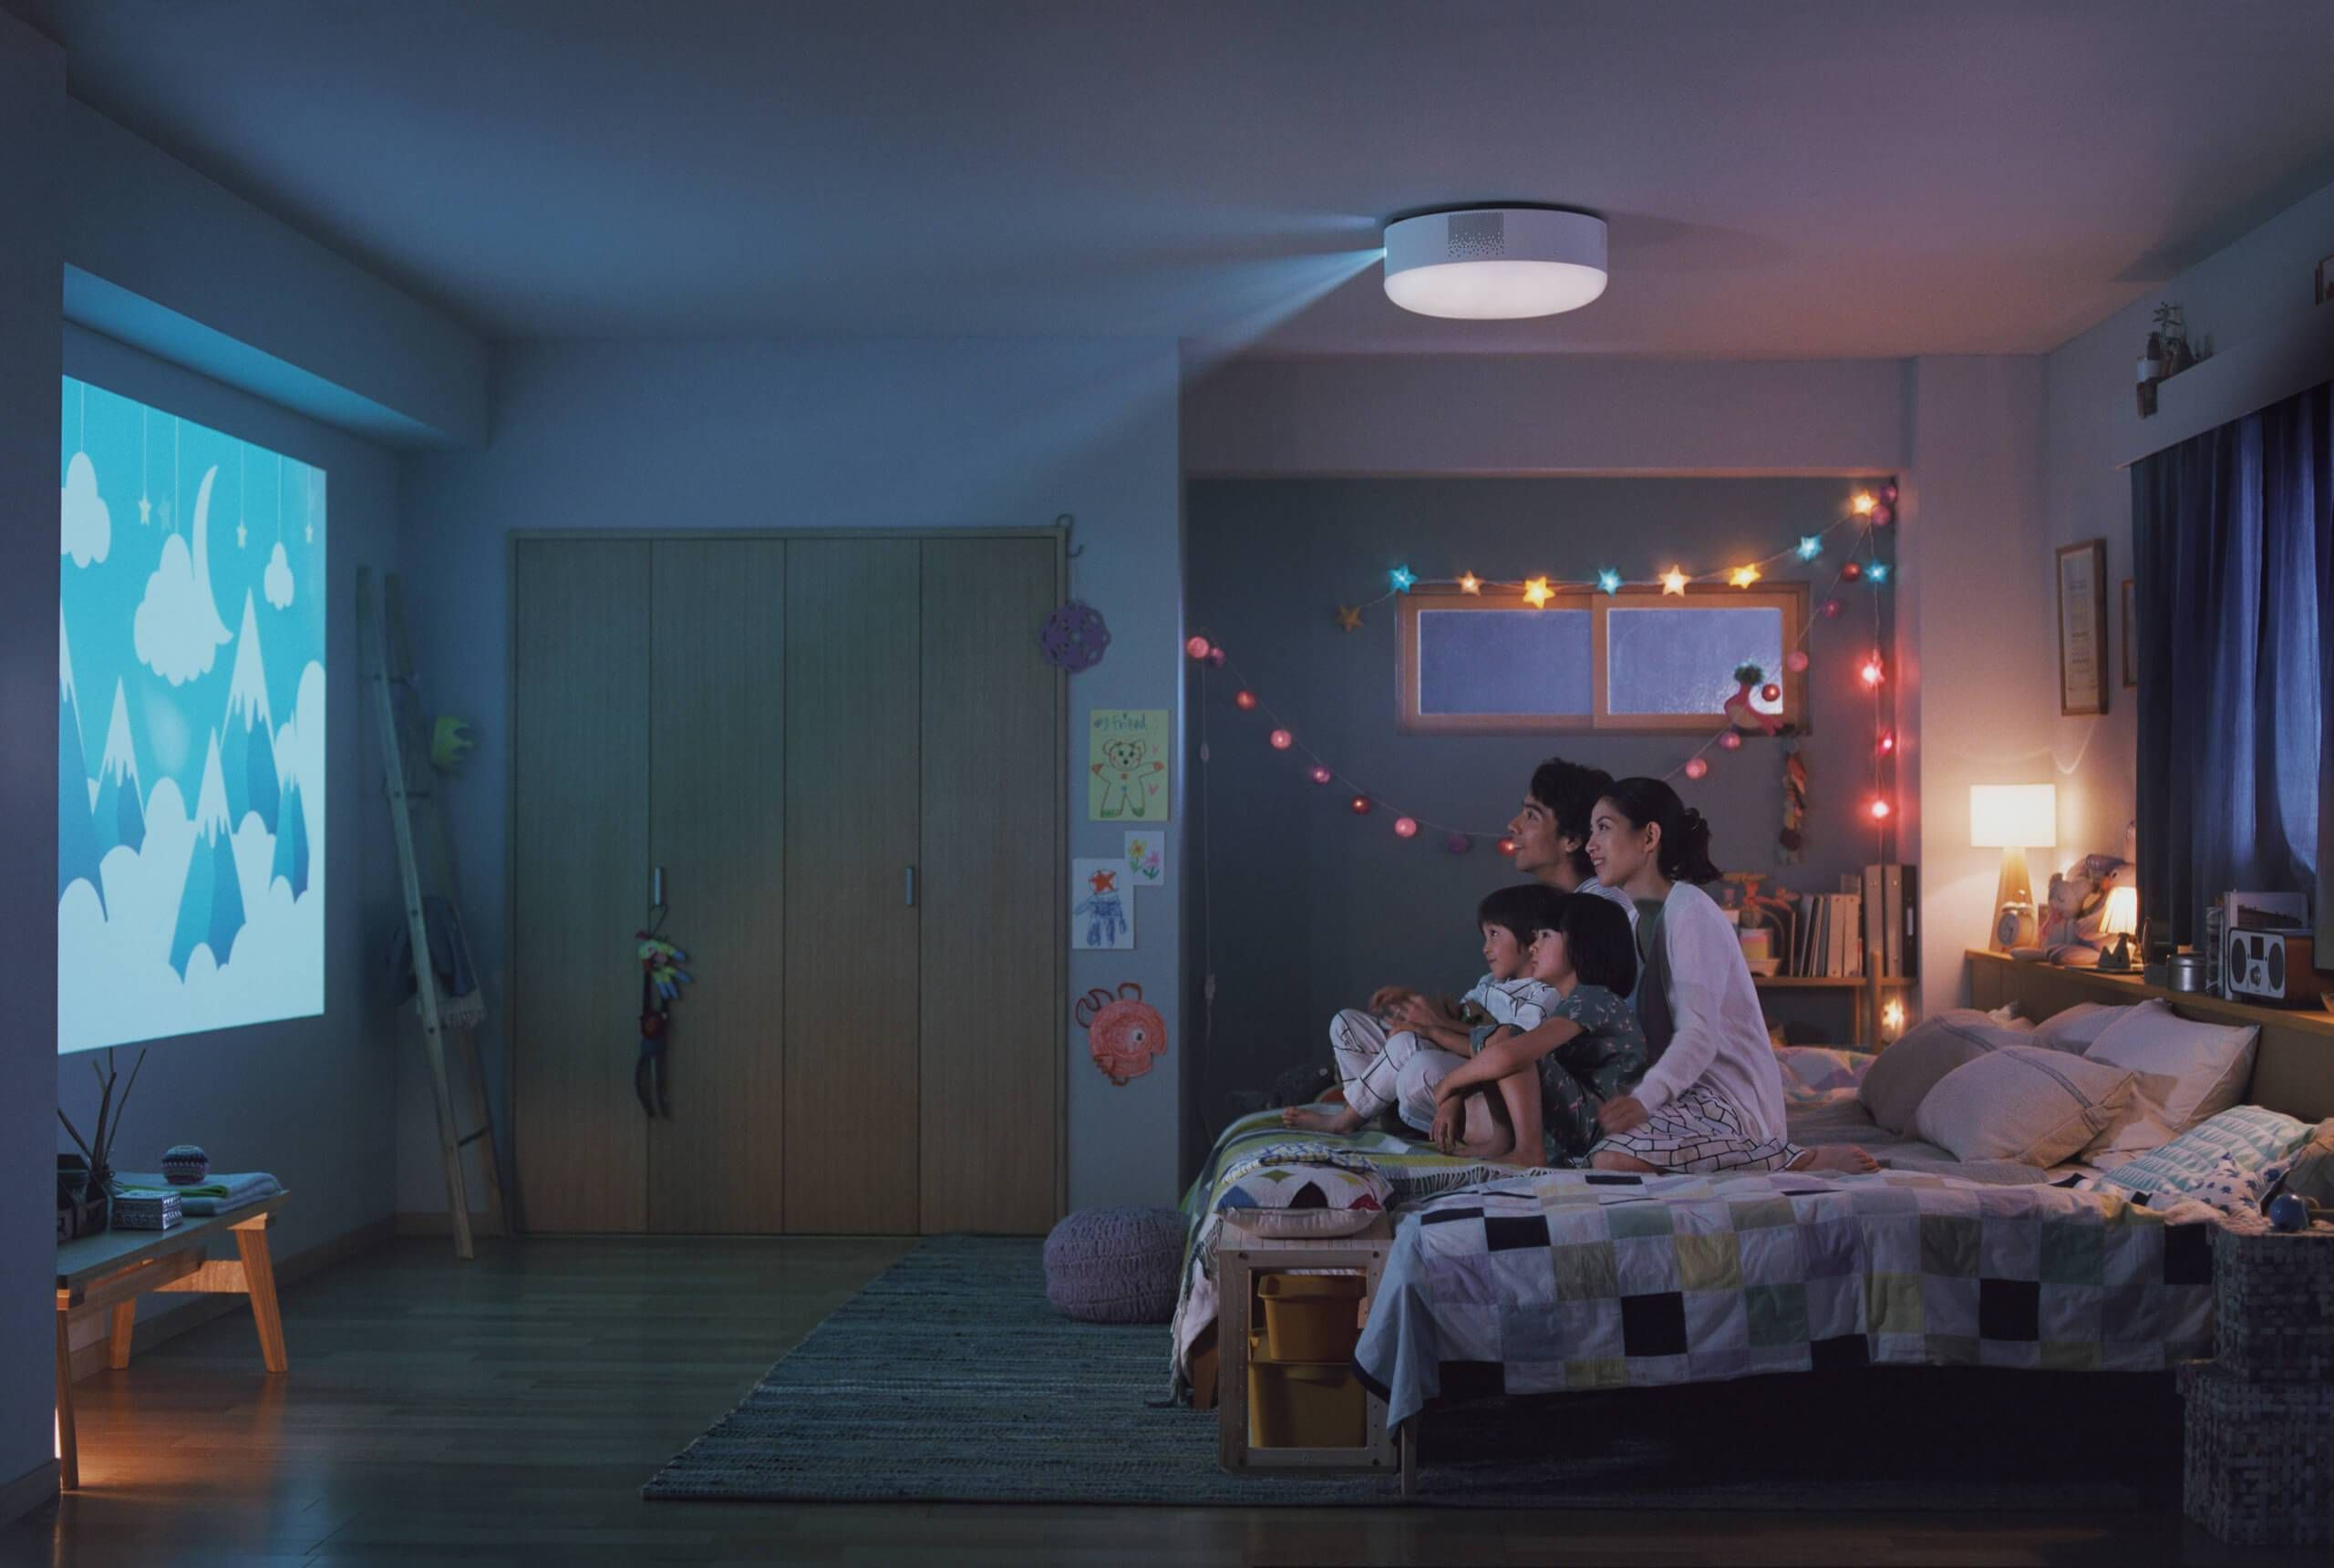 Popin Aladdin 寝室 ライト アラジン 寝室